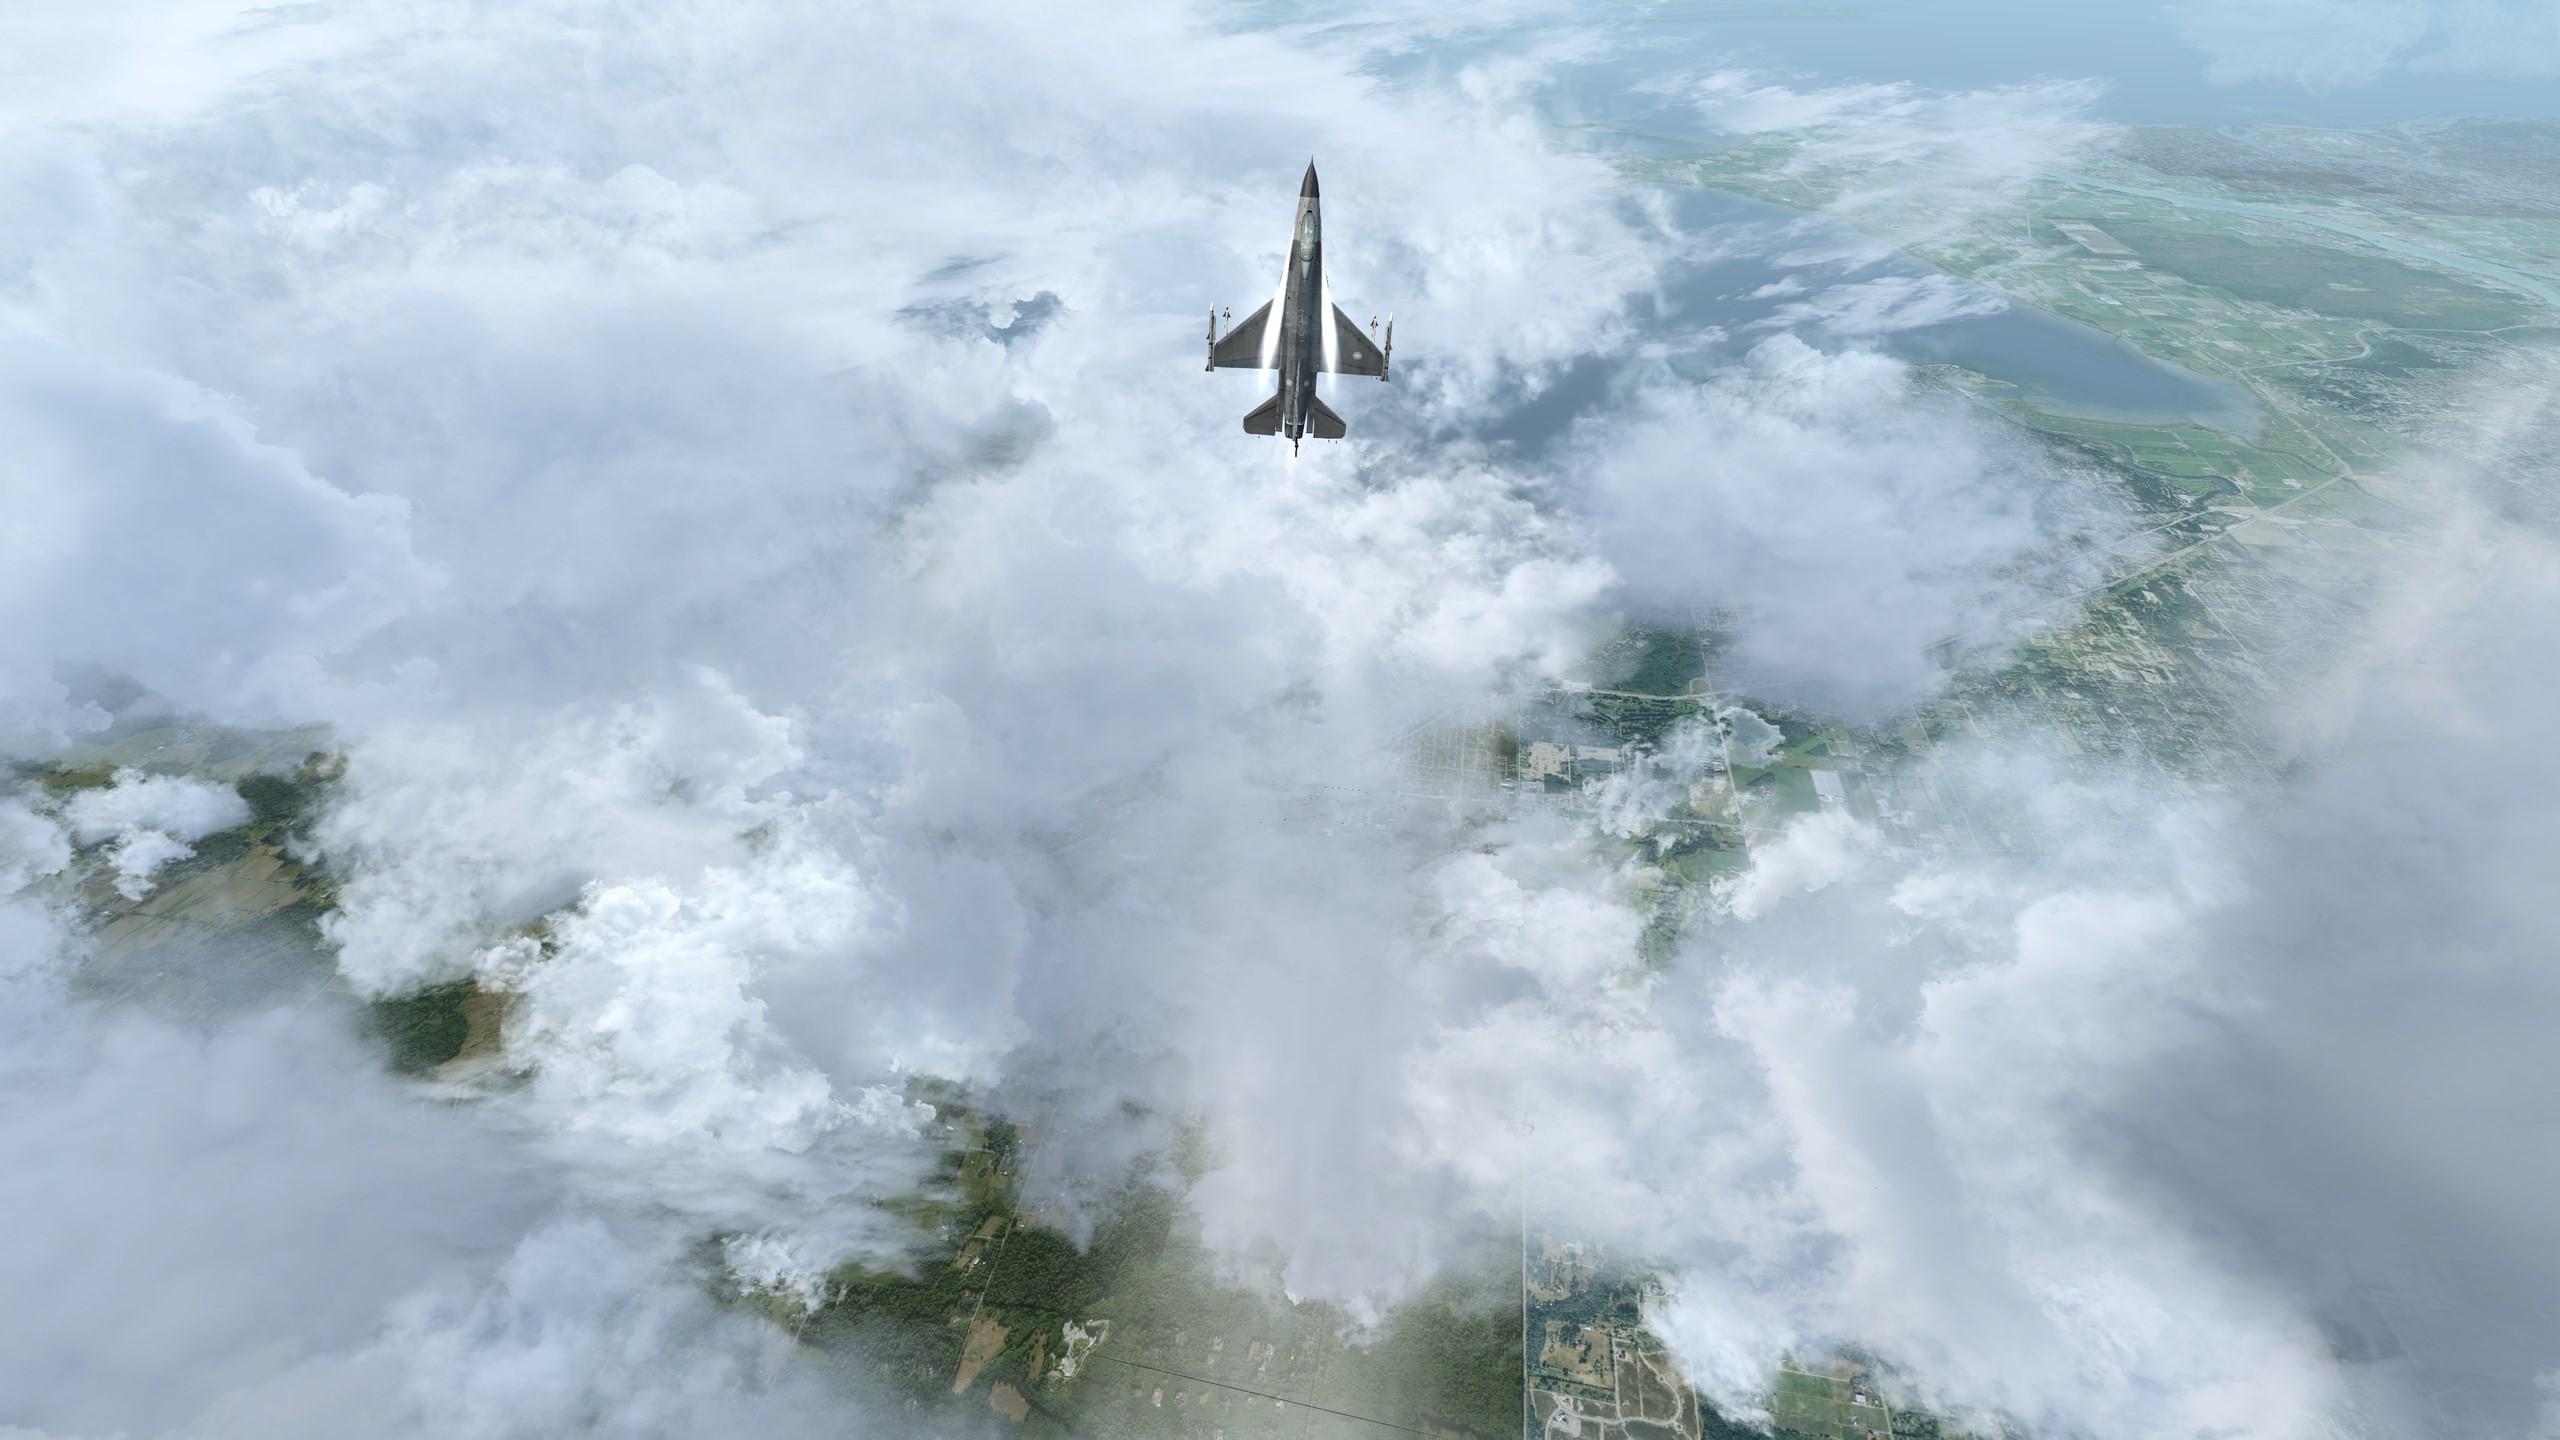 microsoft flight simulator : High Definition Background 2560×1440